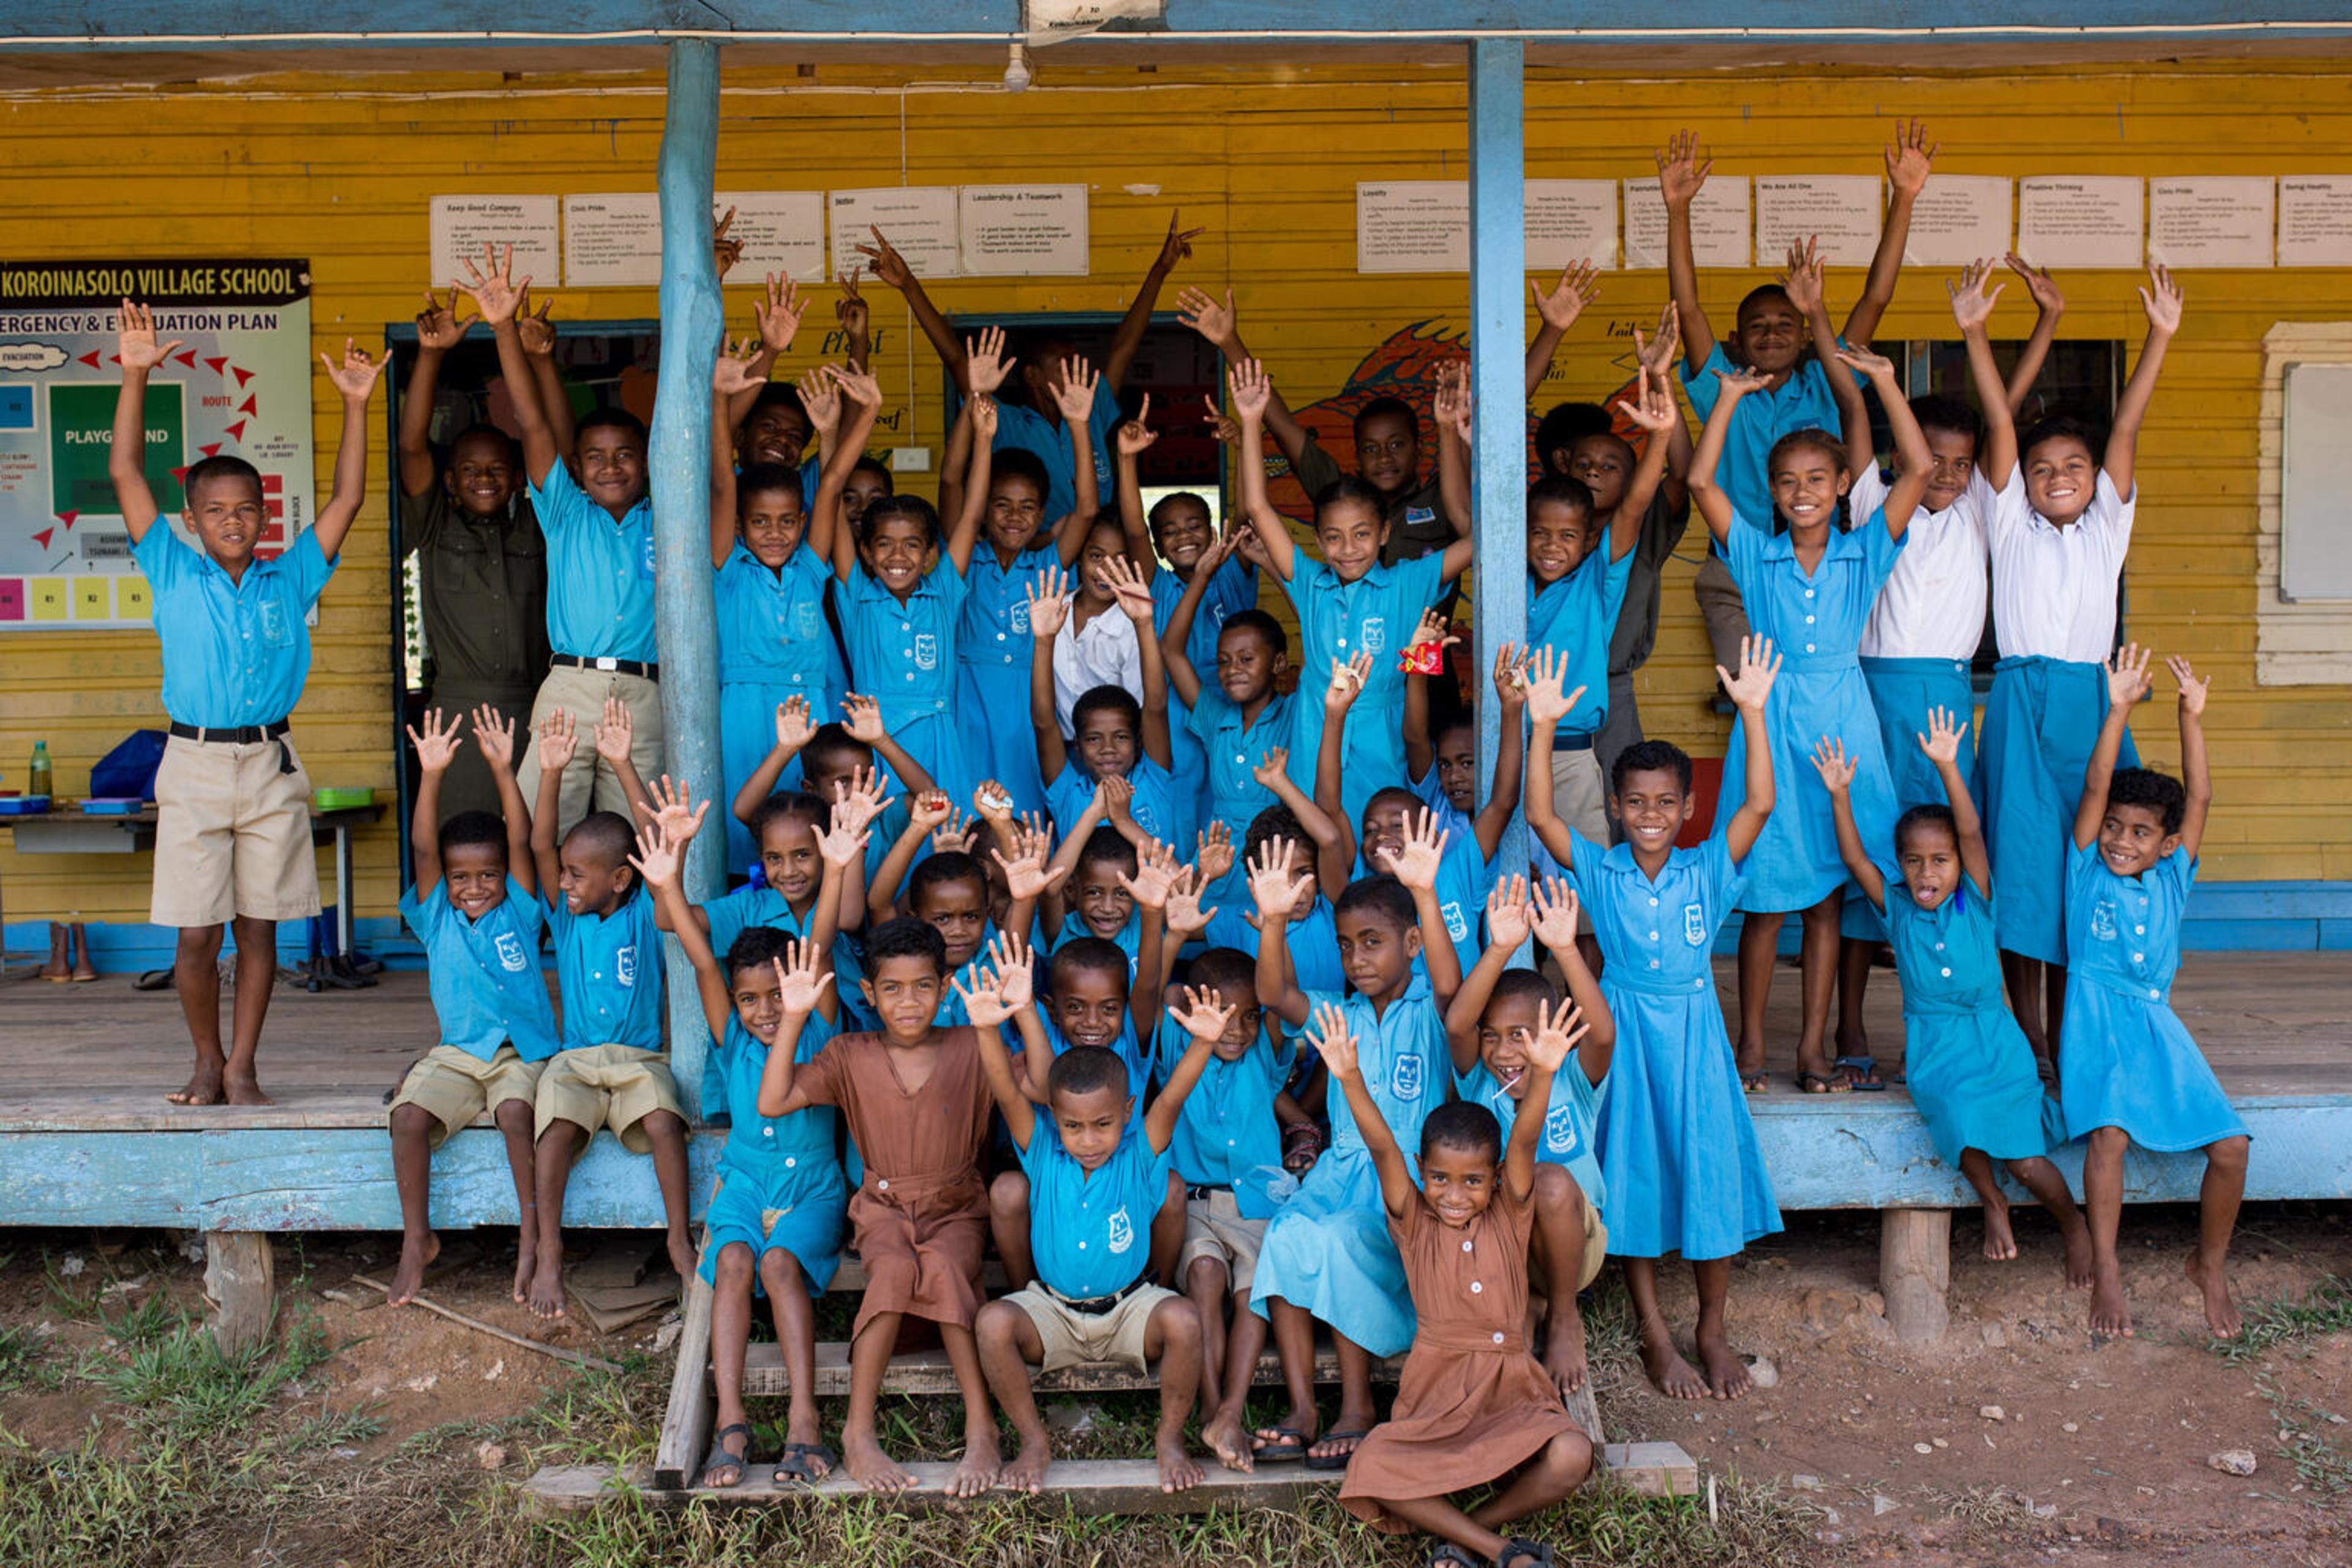 © UNICEF/UN0410144/Stephen/Infinity Images